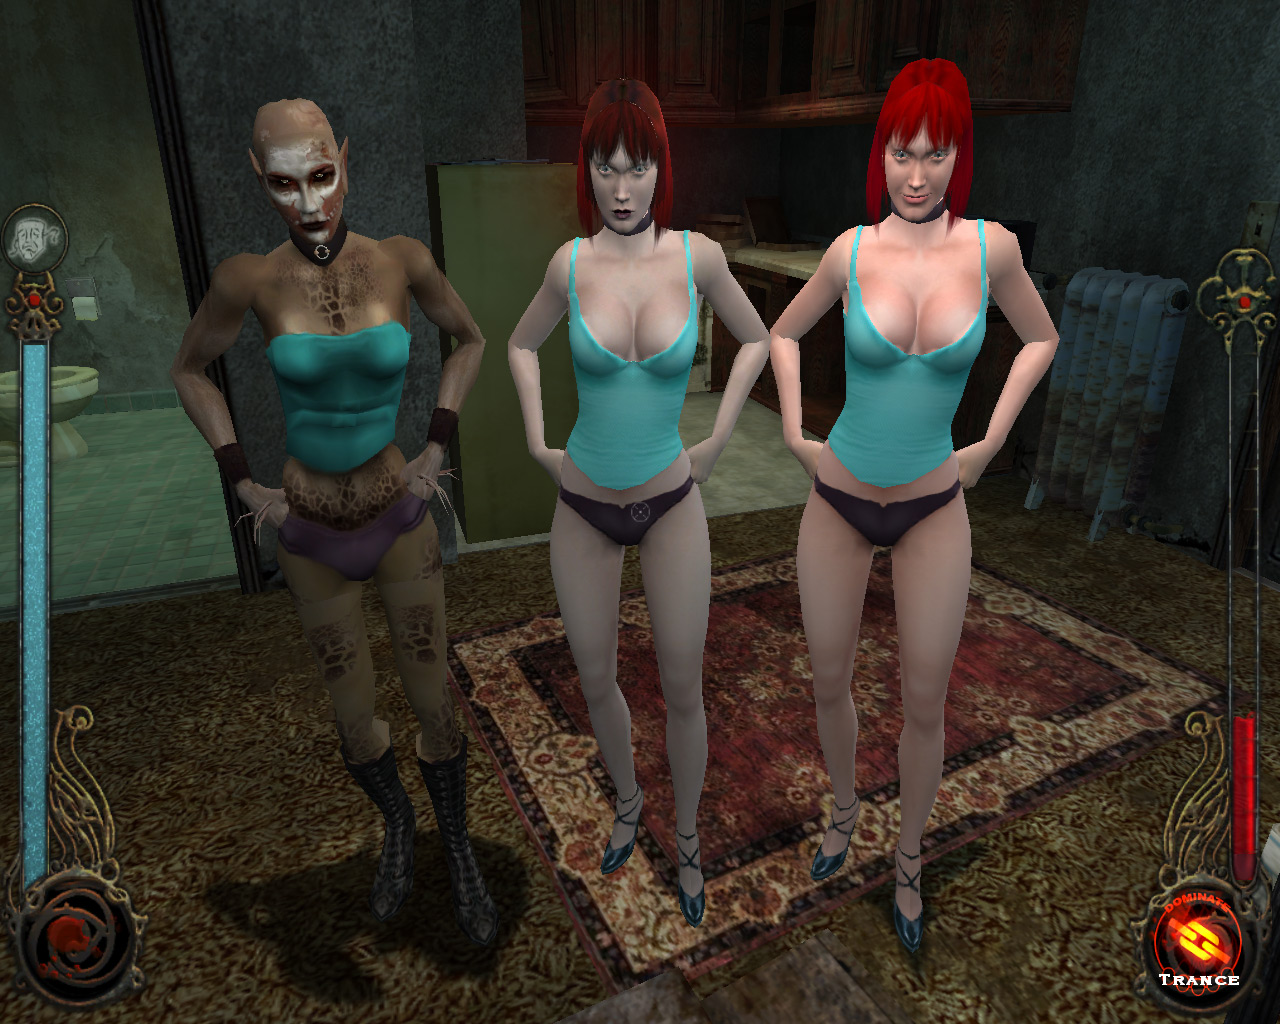 Goth chicks tumblr